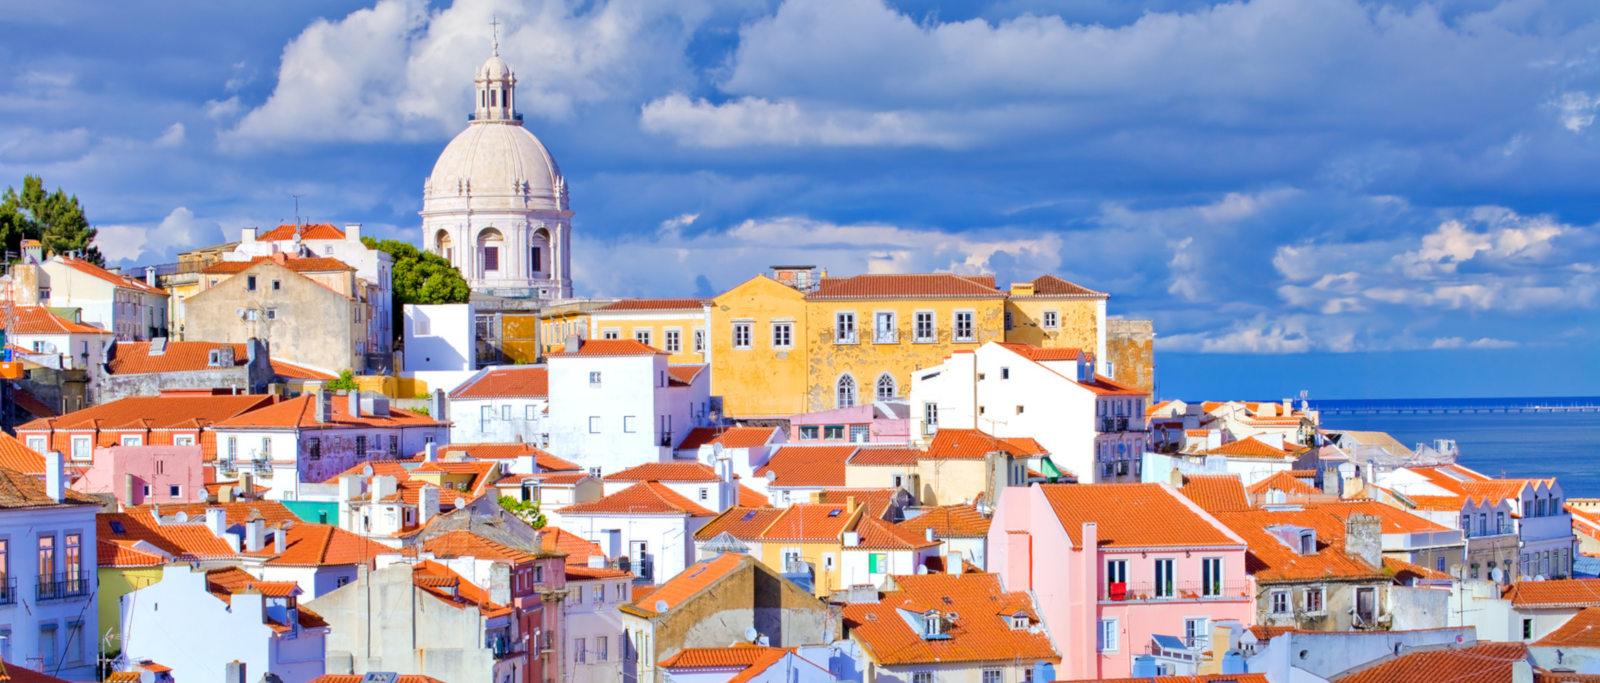 Portugal : terre d'accueil des investissements immobiliers